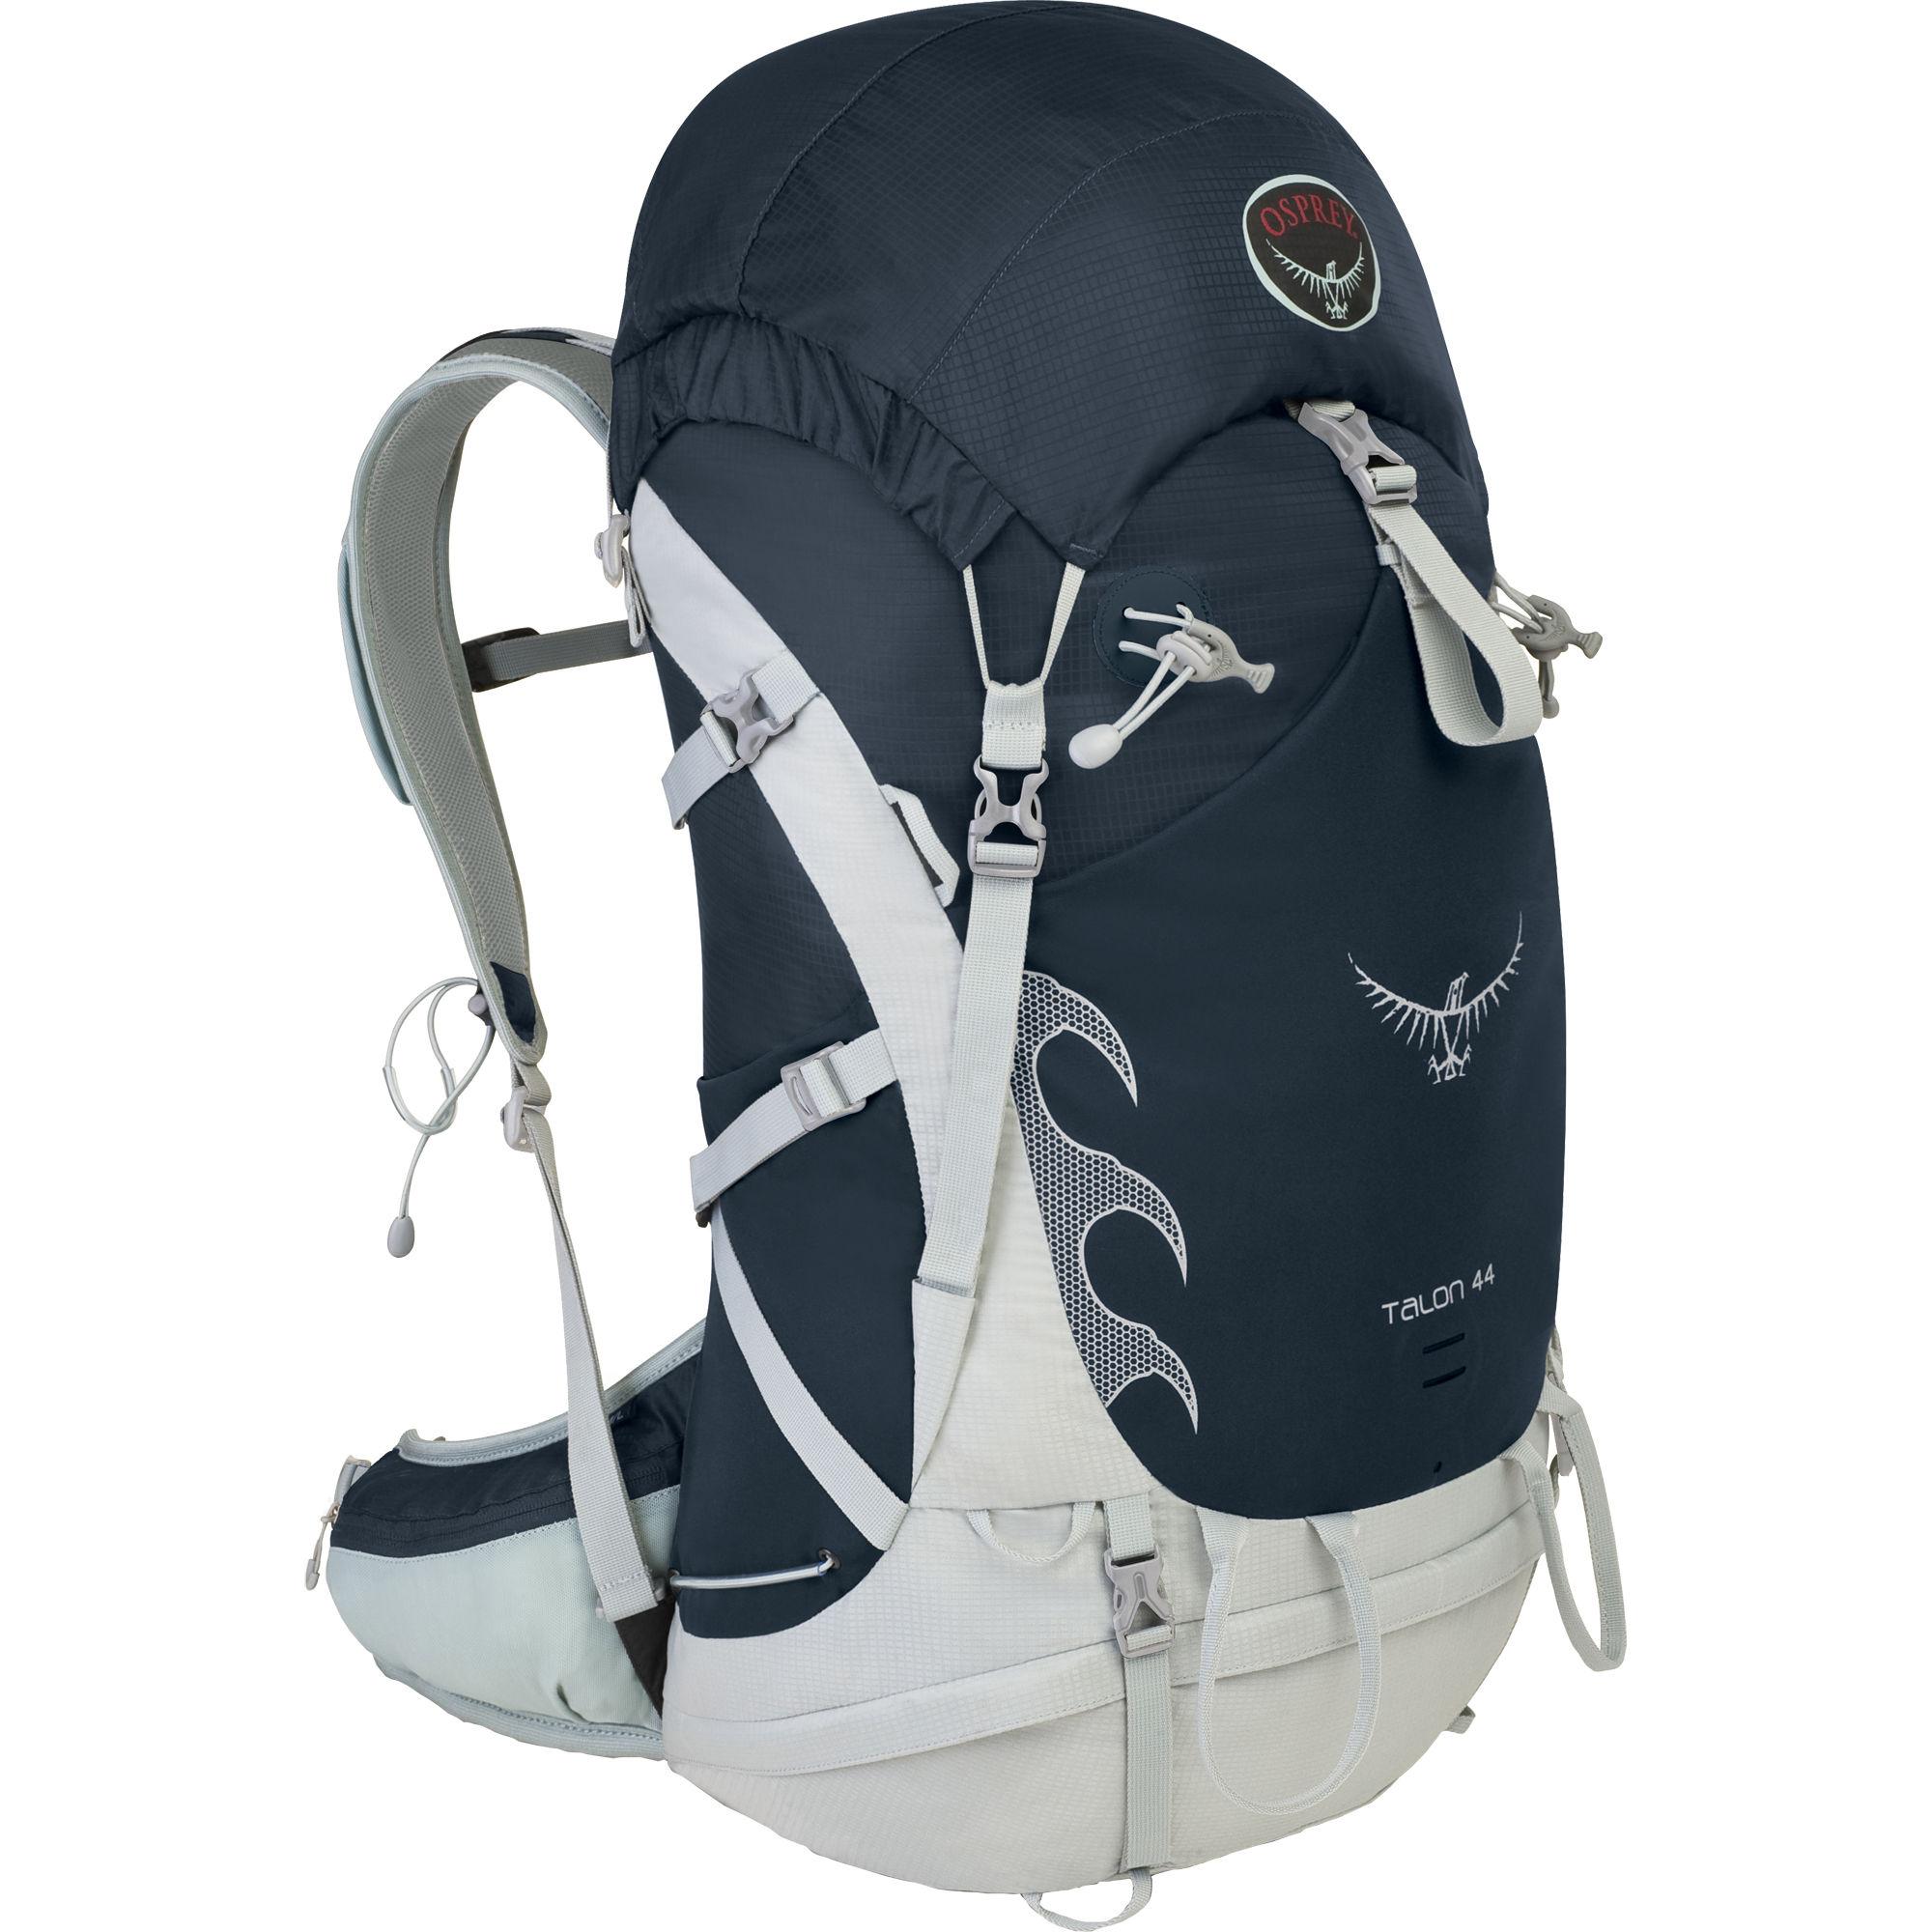 Osprey talon 44 medium Backpack